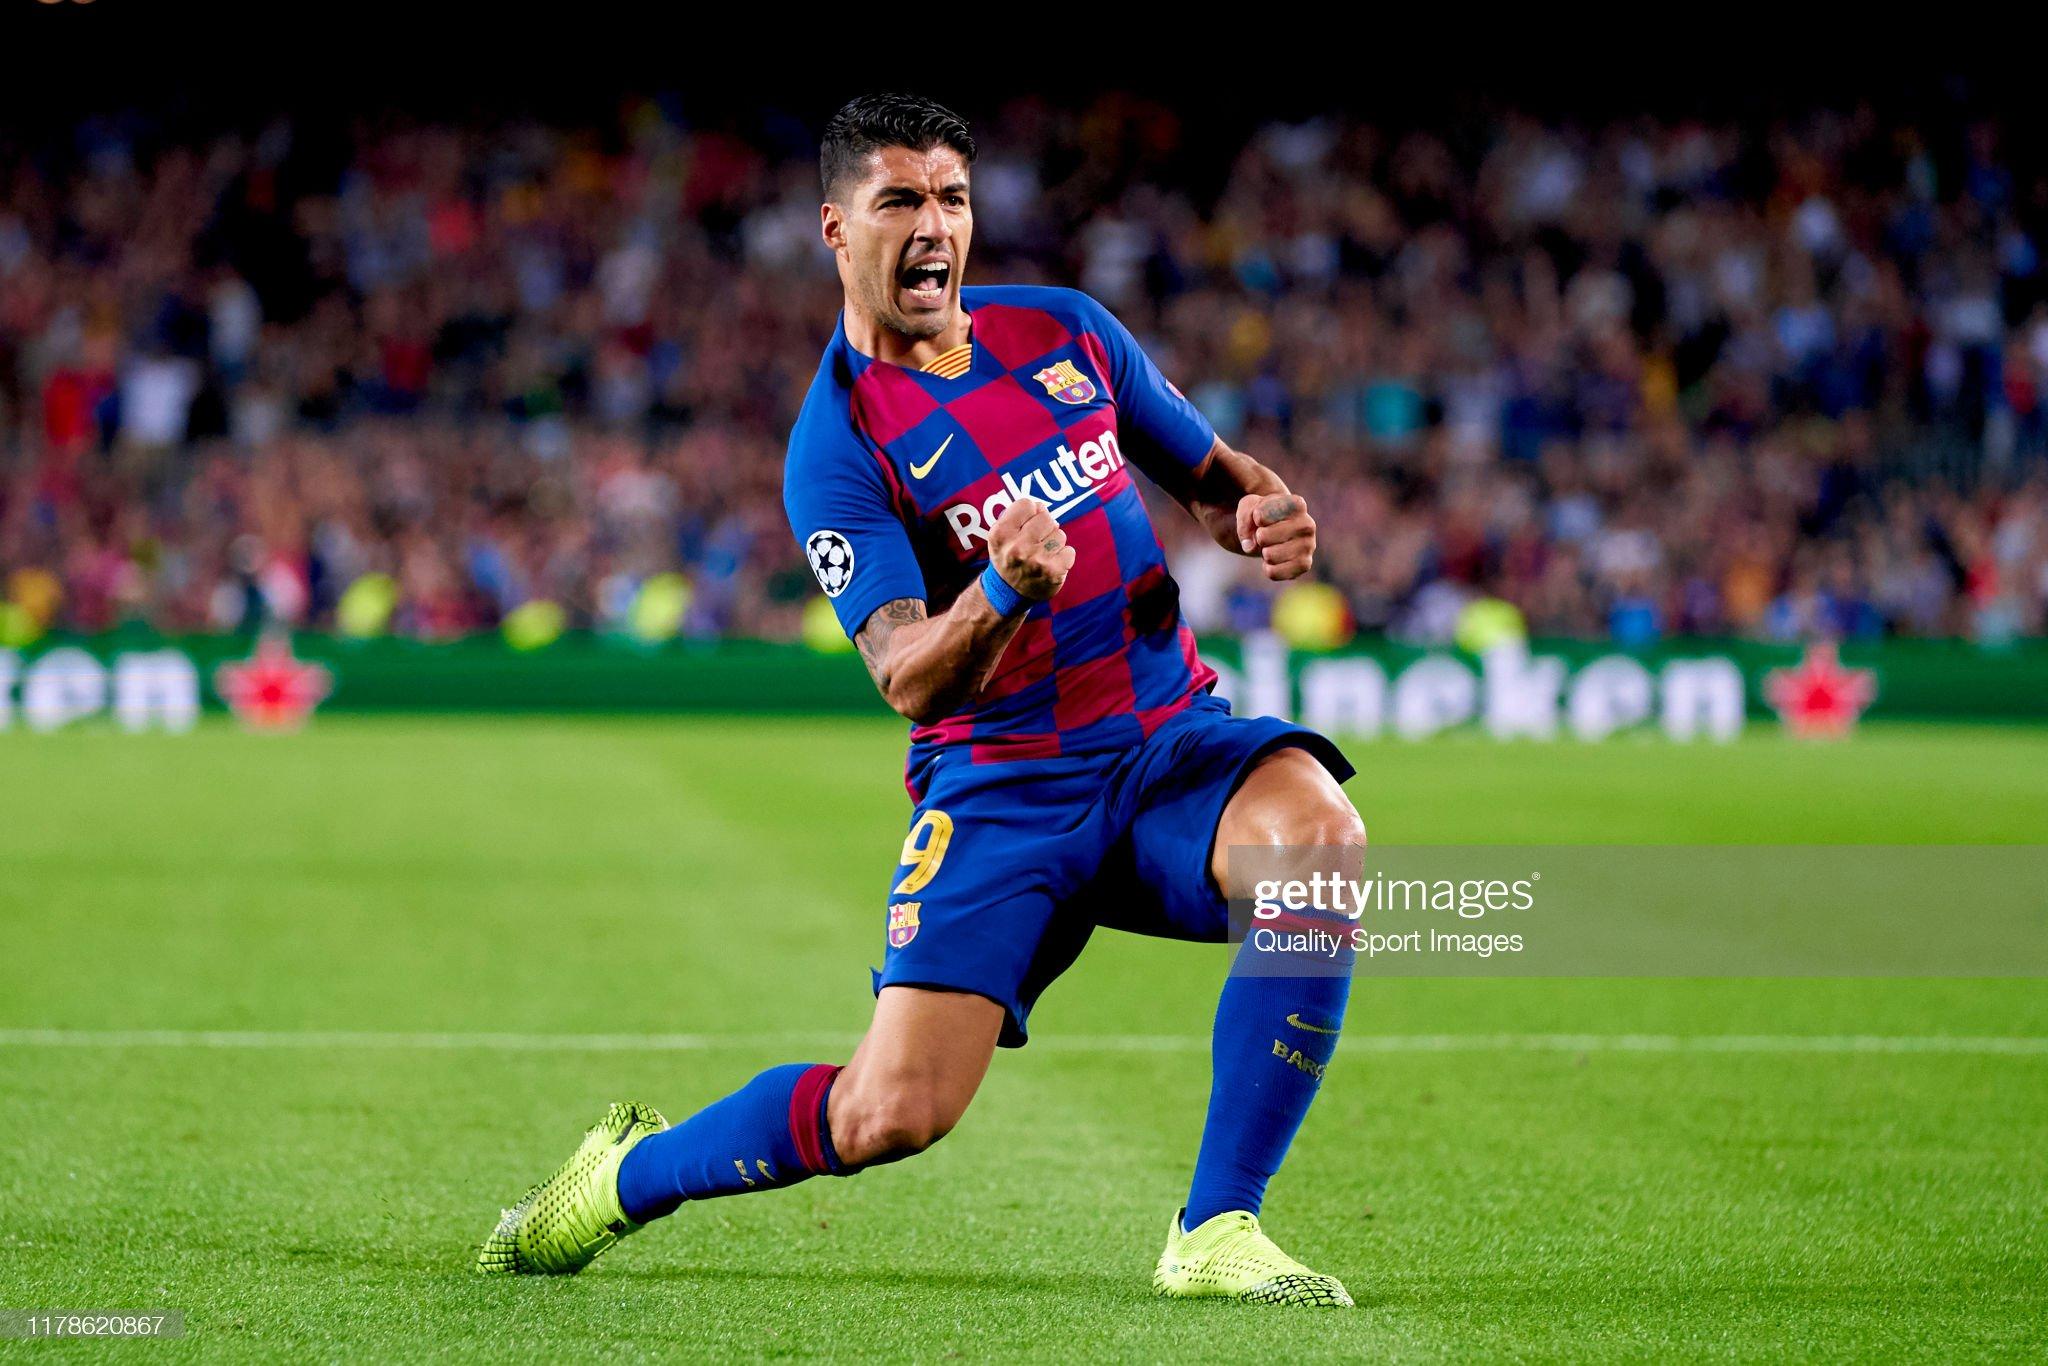 صور مباراة : برشلونة - إنتر 2-1 ( 02-10-2019 )  Luis-suarez-of-fc-barcelona-celebrates-after-scoring-his-teams-first-picture-id1178620867?s=2048x2048